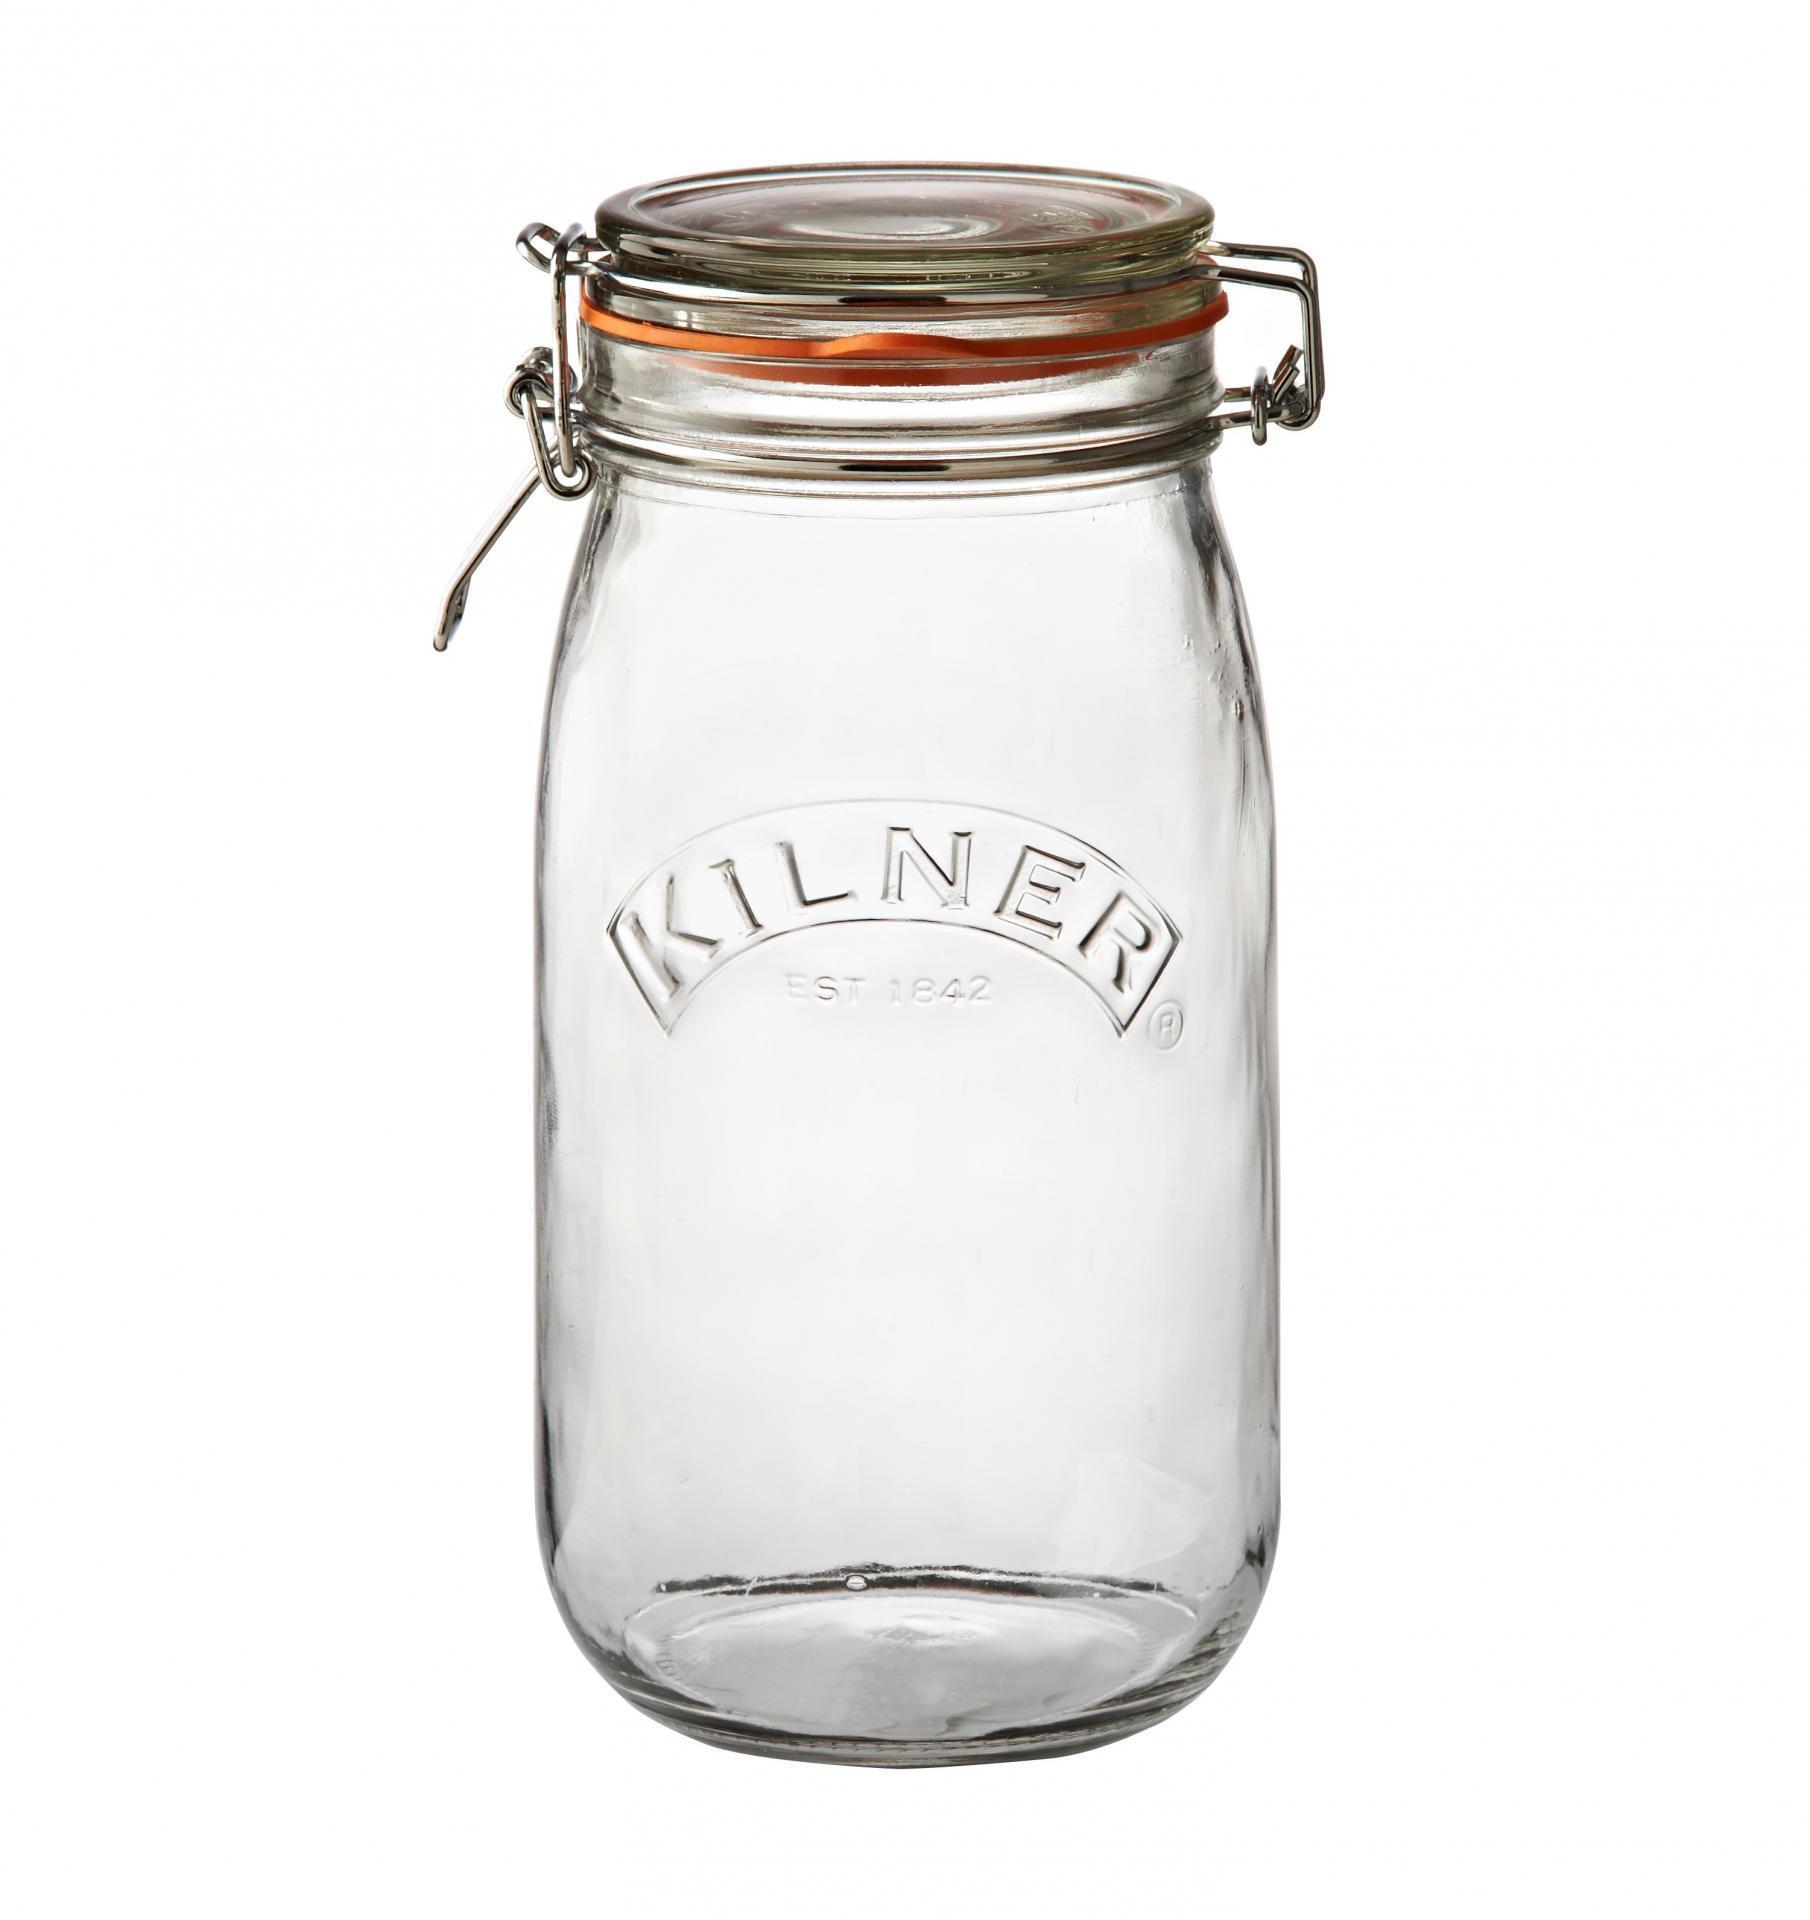 KILNER Kulatá zavařovací sklenice s klipem 1,5 l, čirá barva, sklo